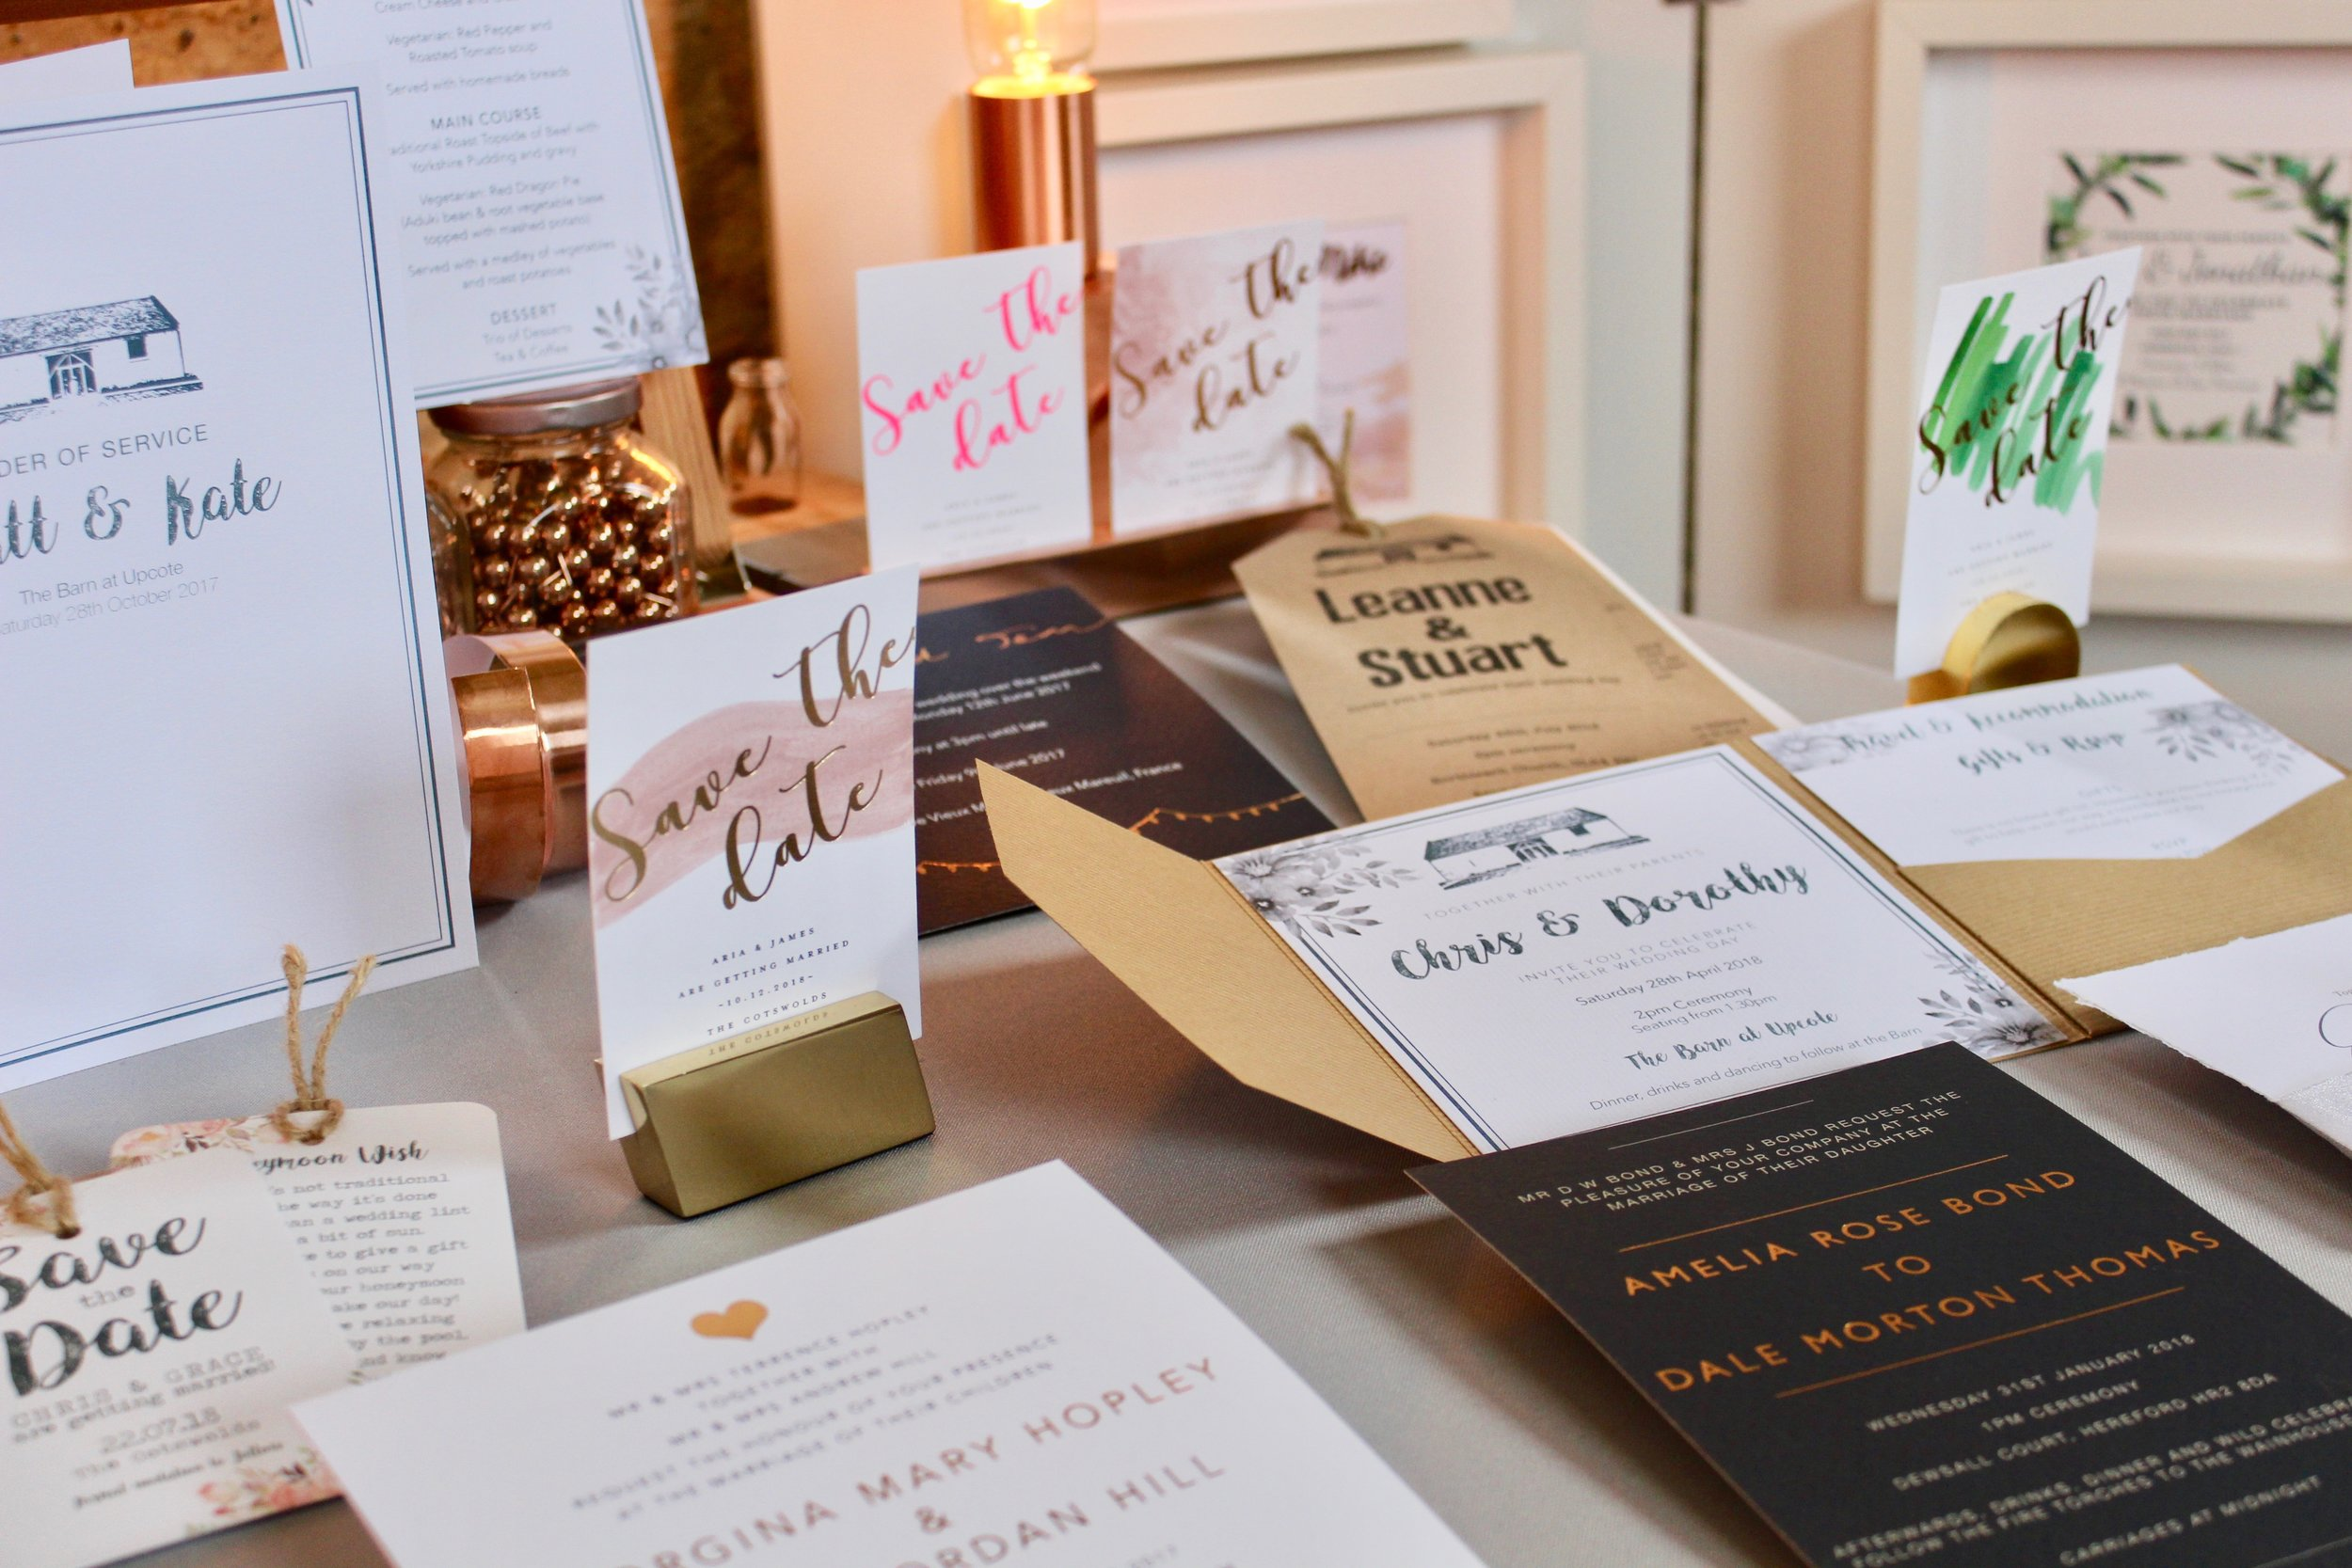 Upcote Barn Wedding Fair